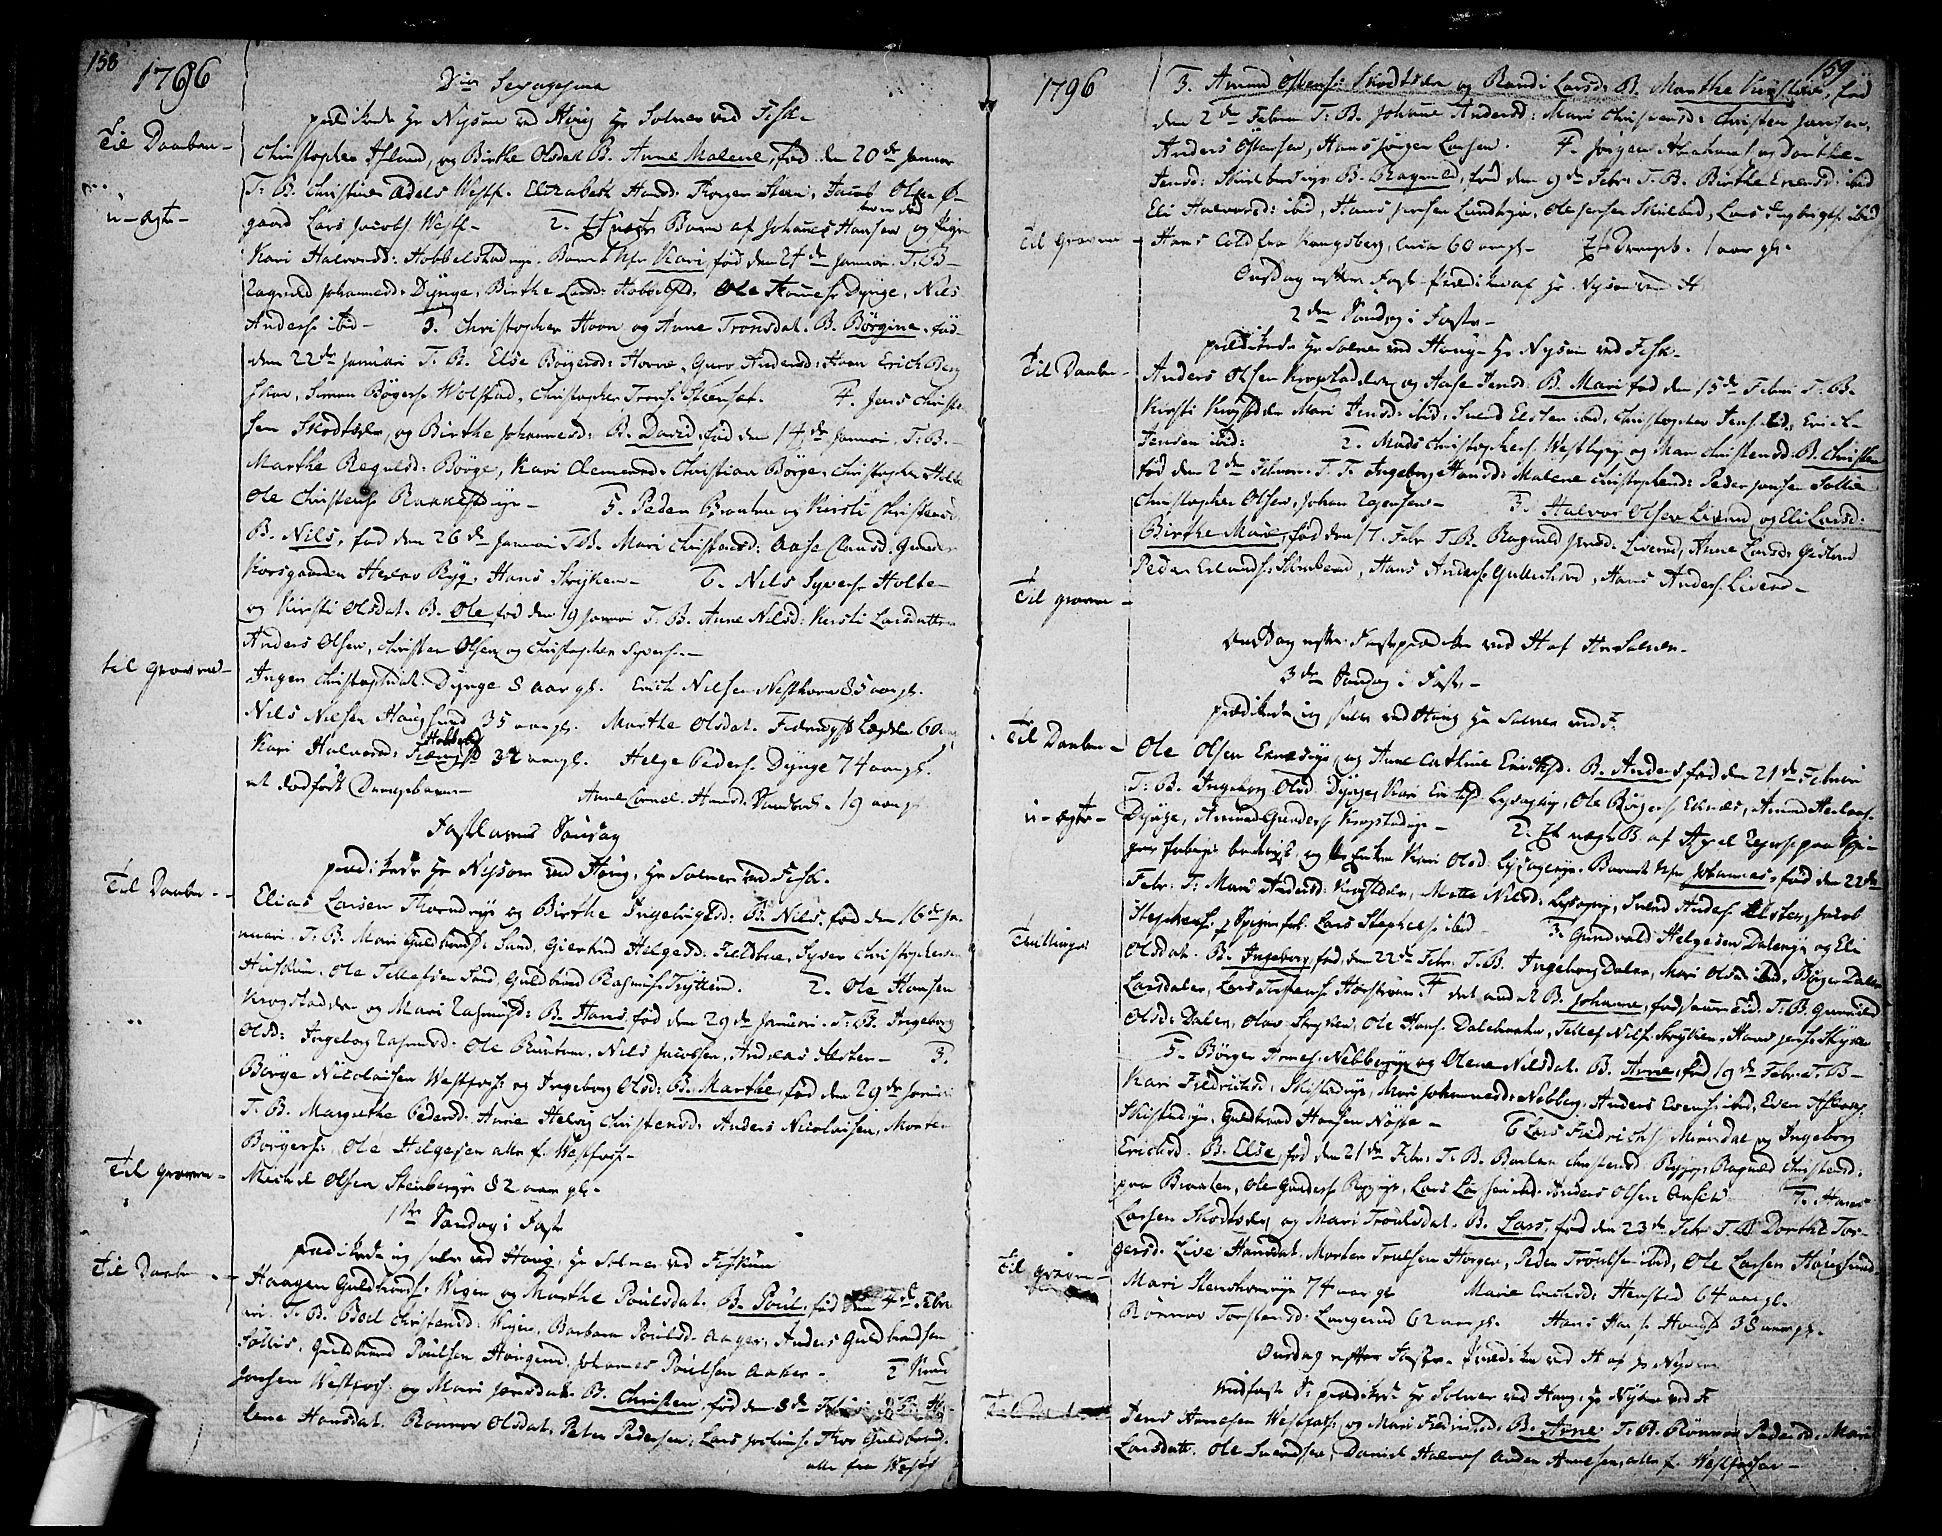 SAKO, Eiker kirkebøker, F/Fa/L0009: Ministerialbok nr. I 9, 1789-1806, s. 158-159